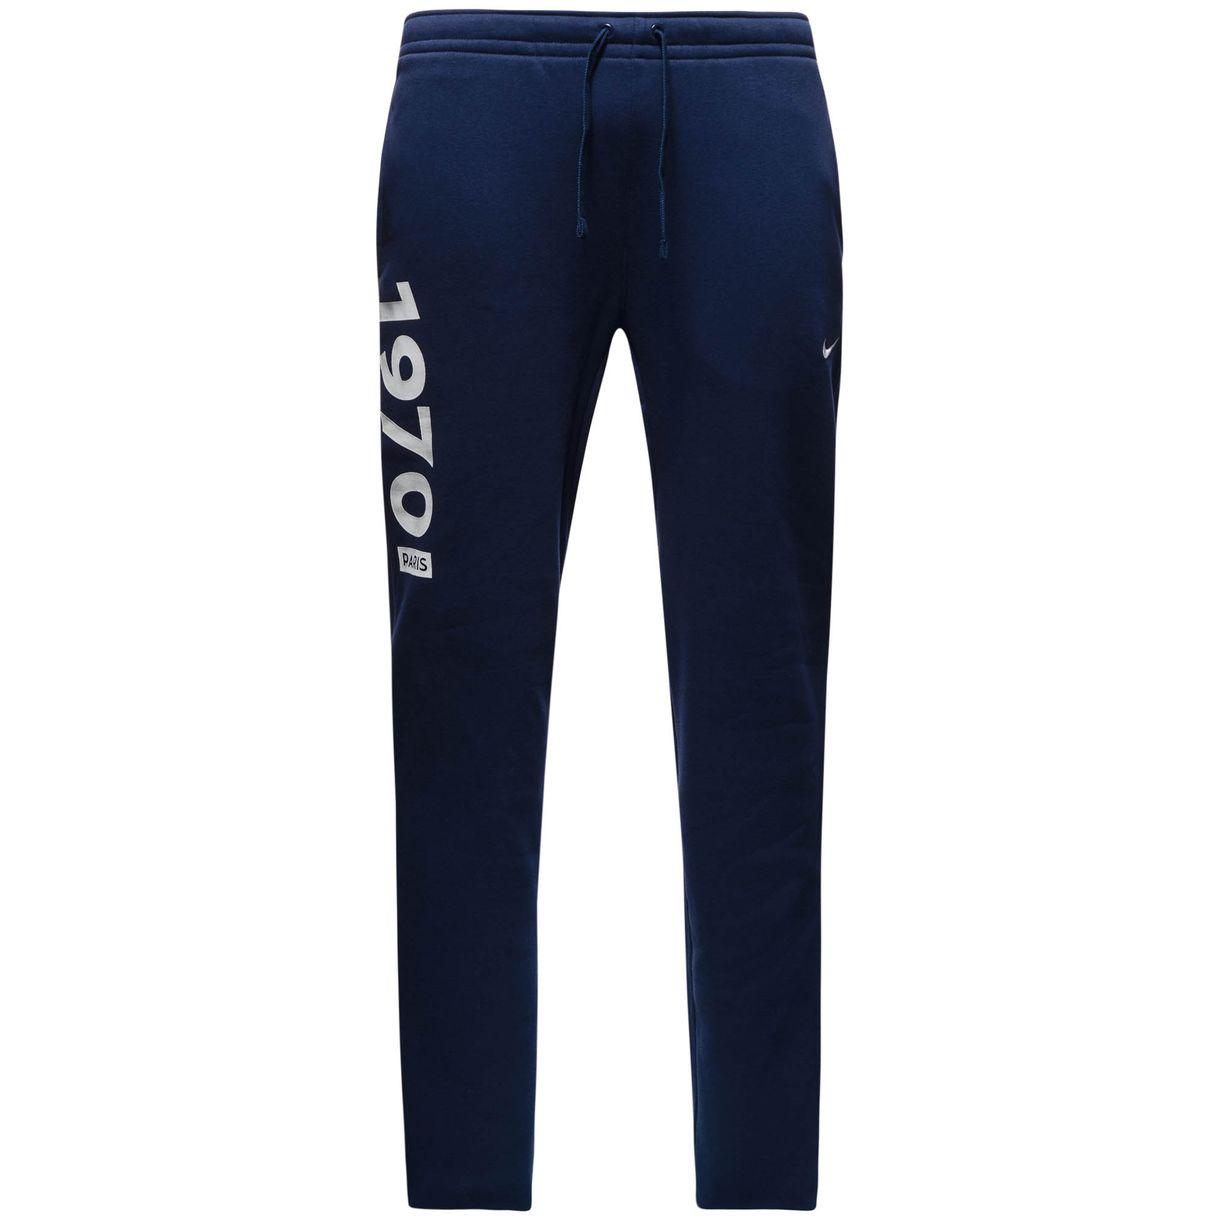 2016-2017 PSG Nike Core Cuff Fleece Pants (Navy)